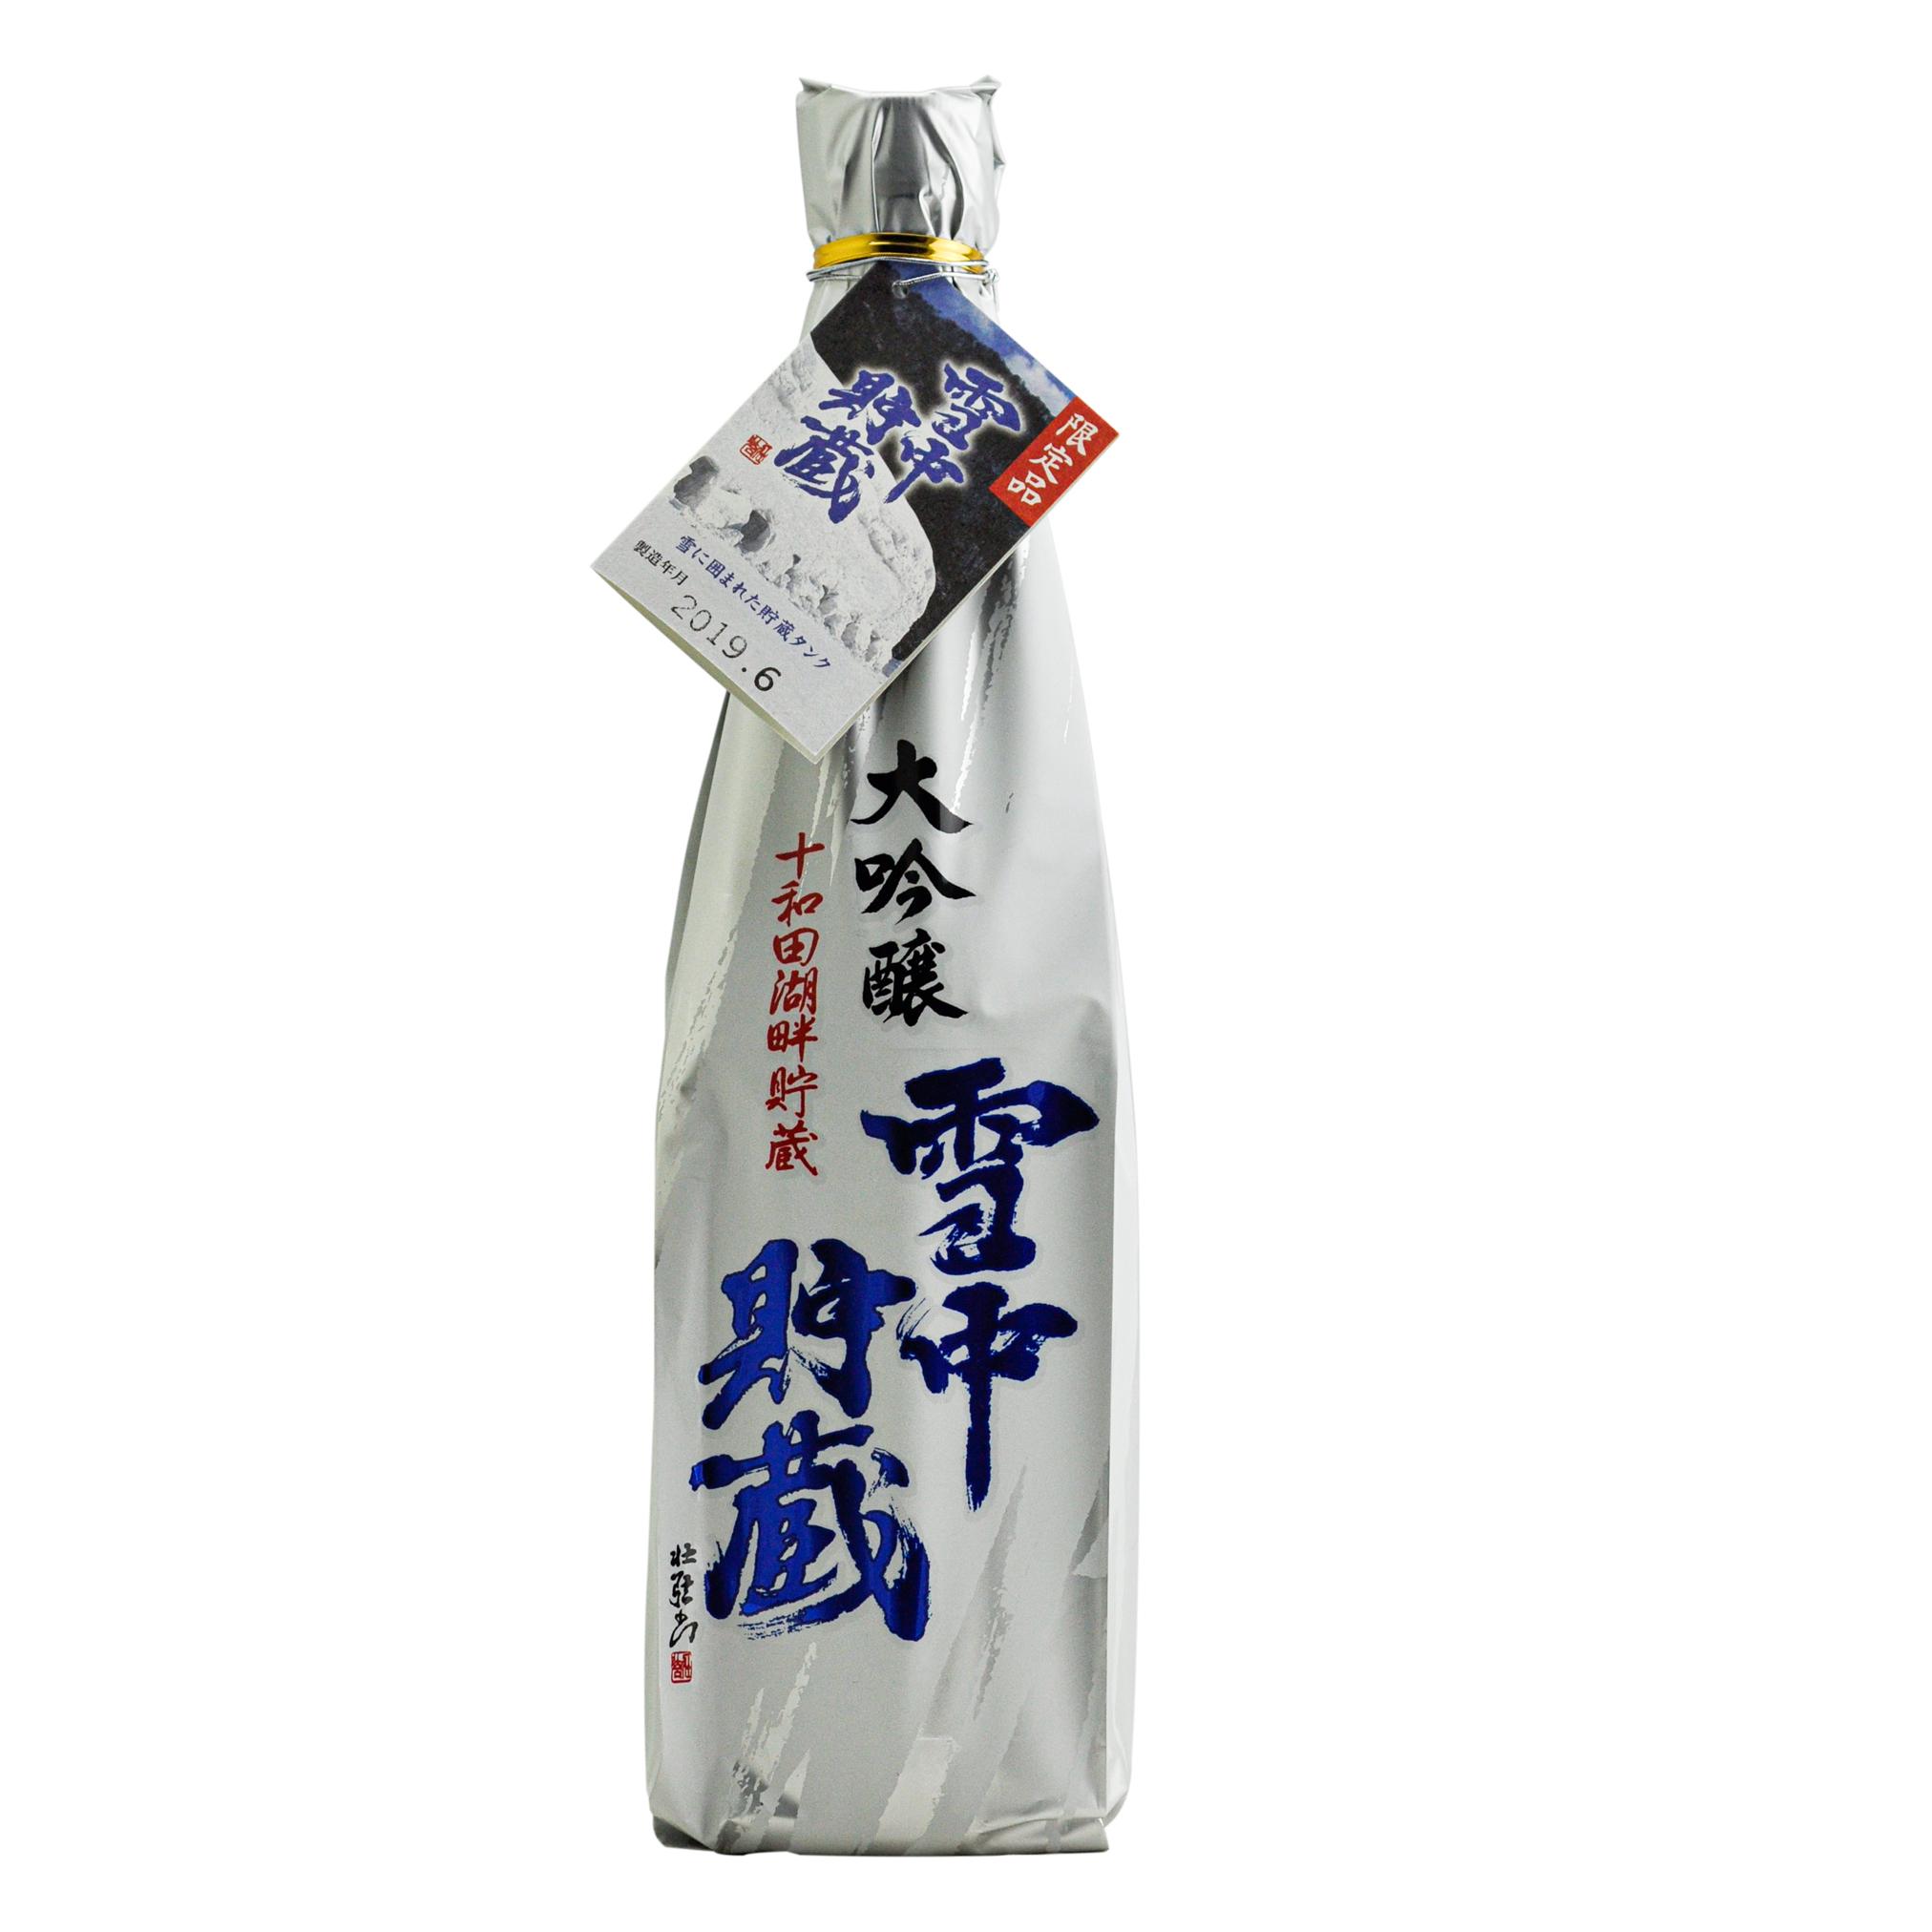 Hokushika Daiginjo Snow Storage 16% 720ml